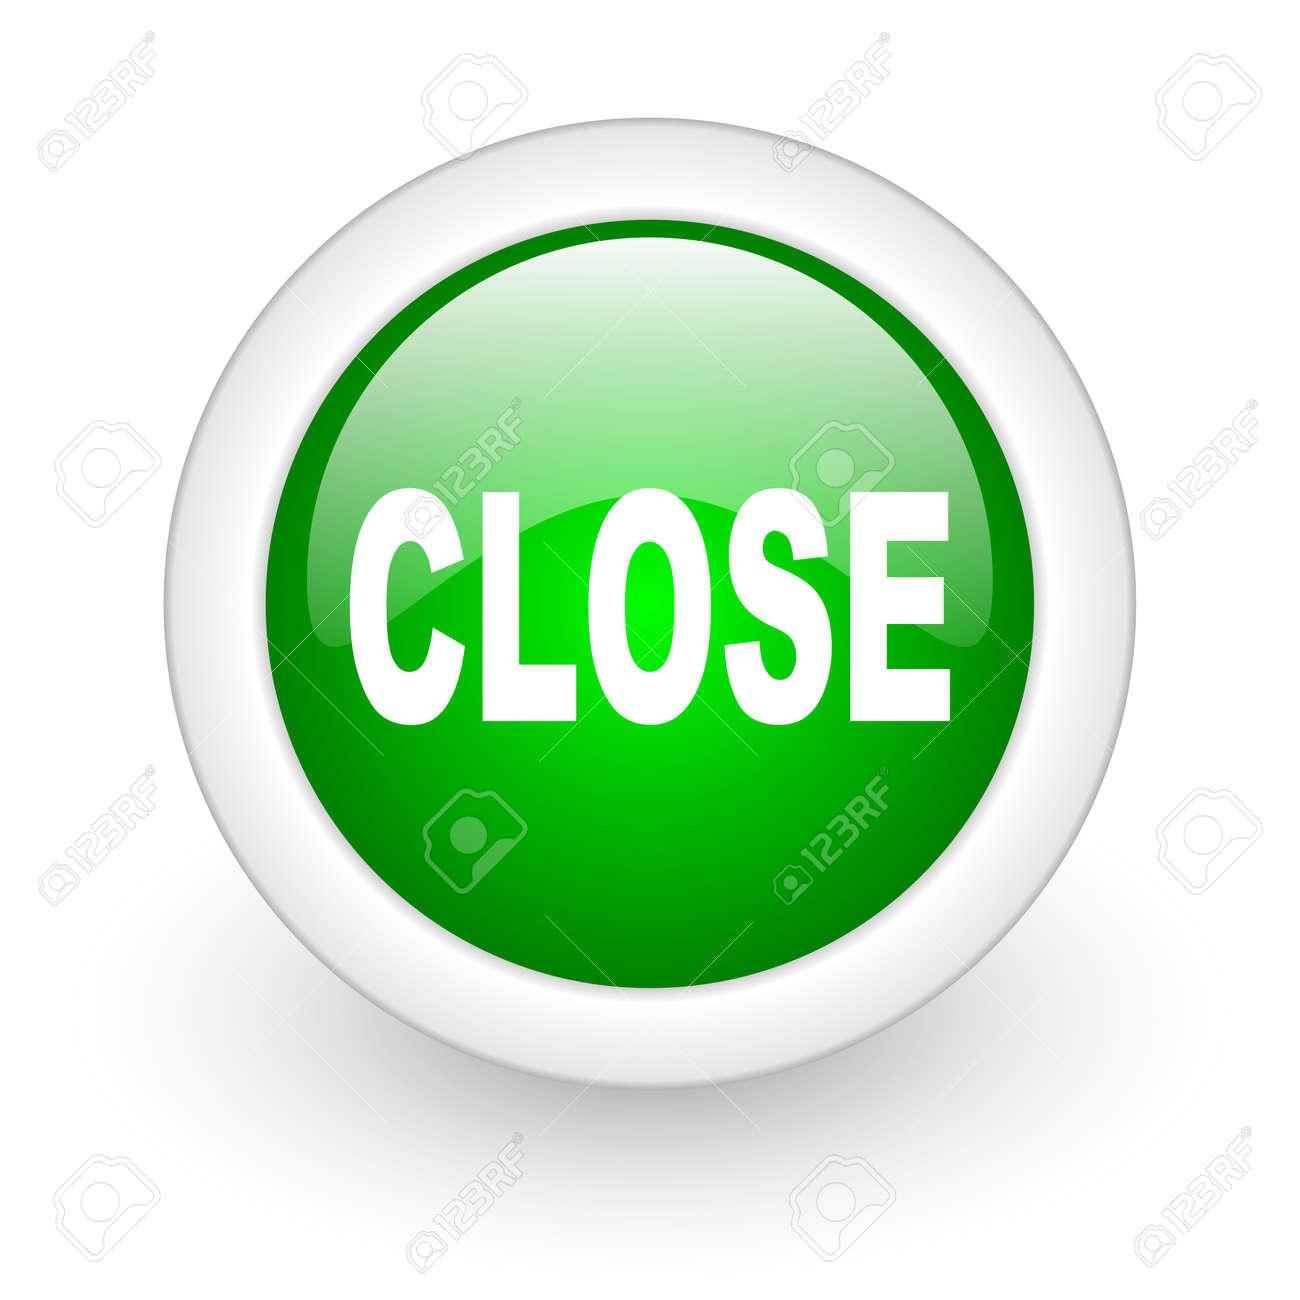 close green circle glossy web icon on white background Stock Photo - 17865141